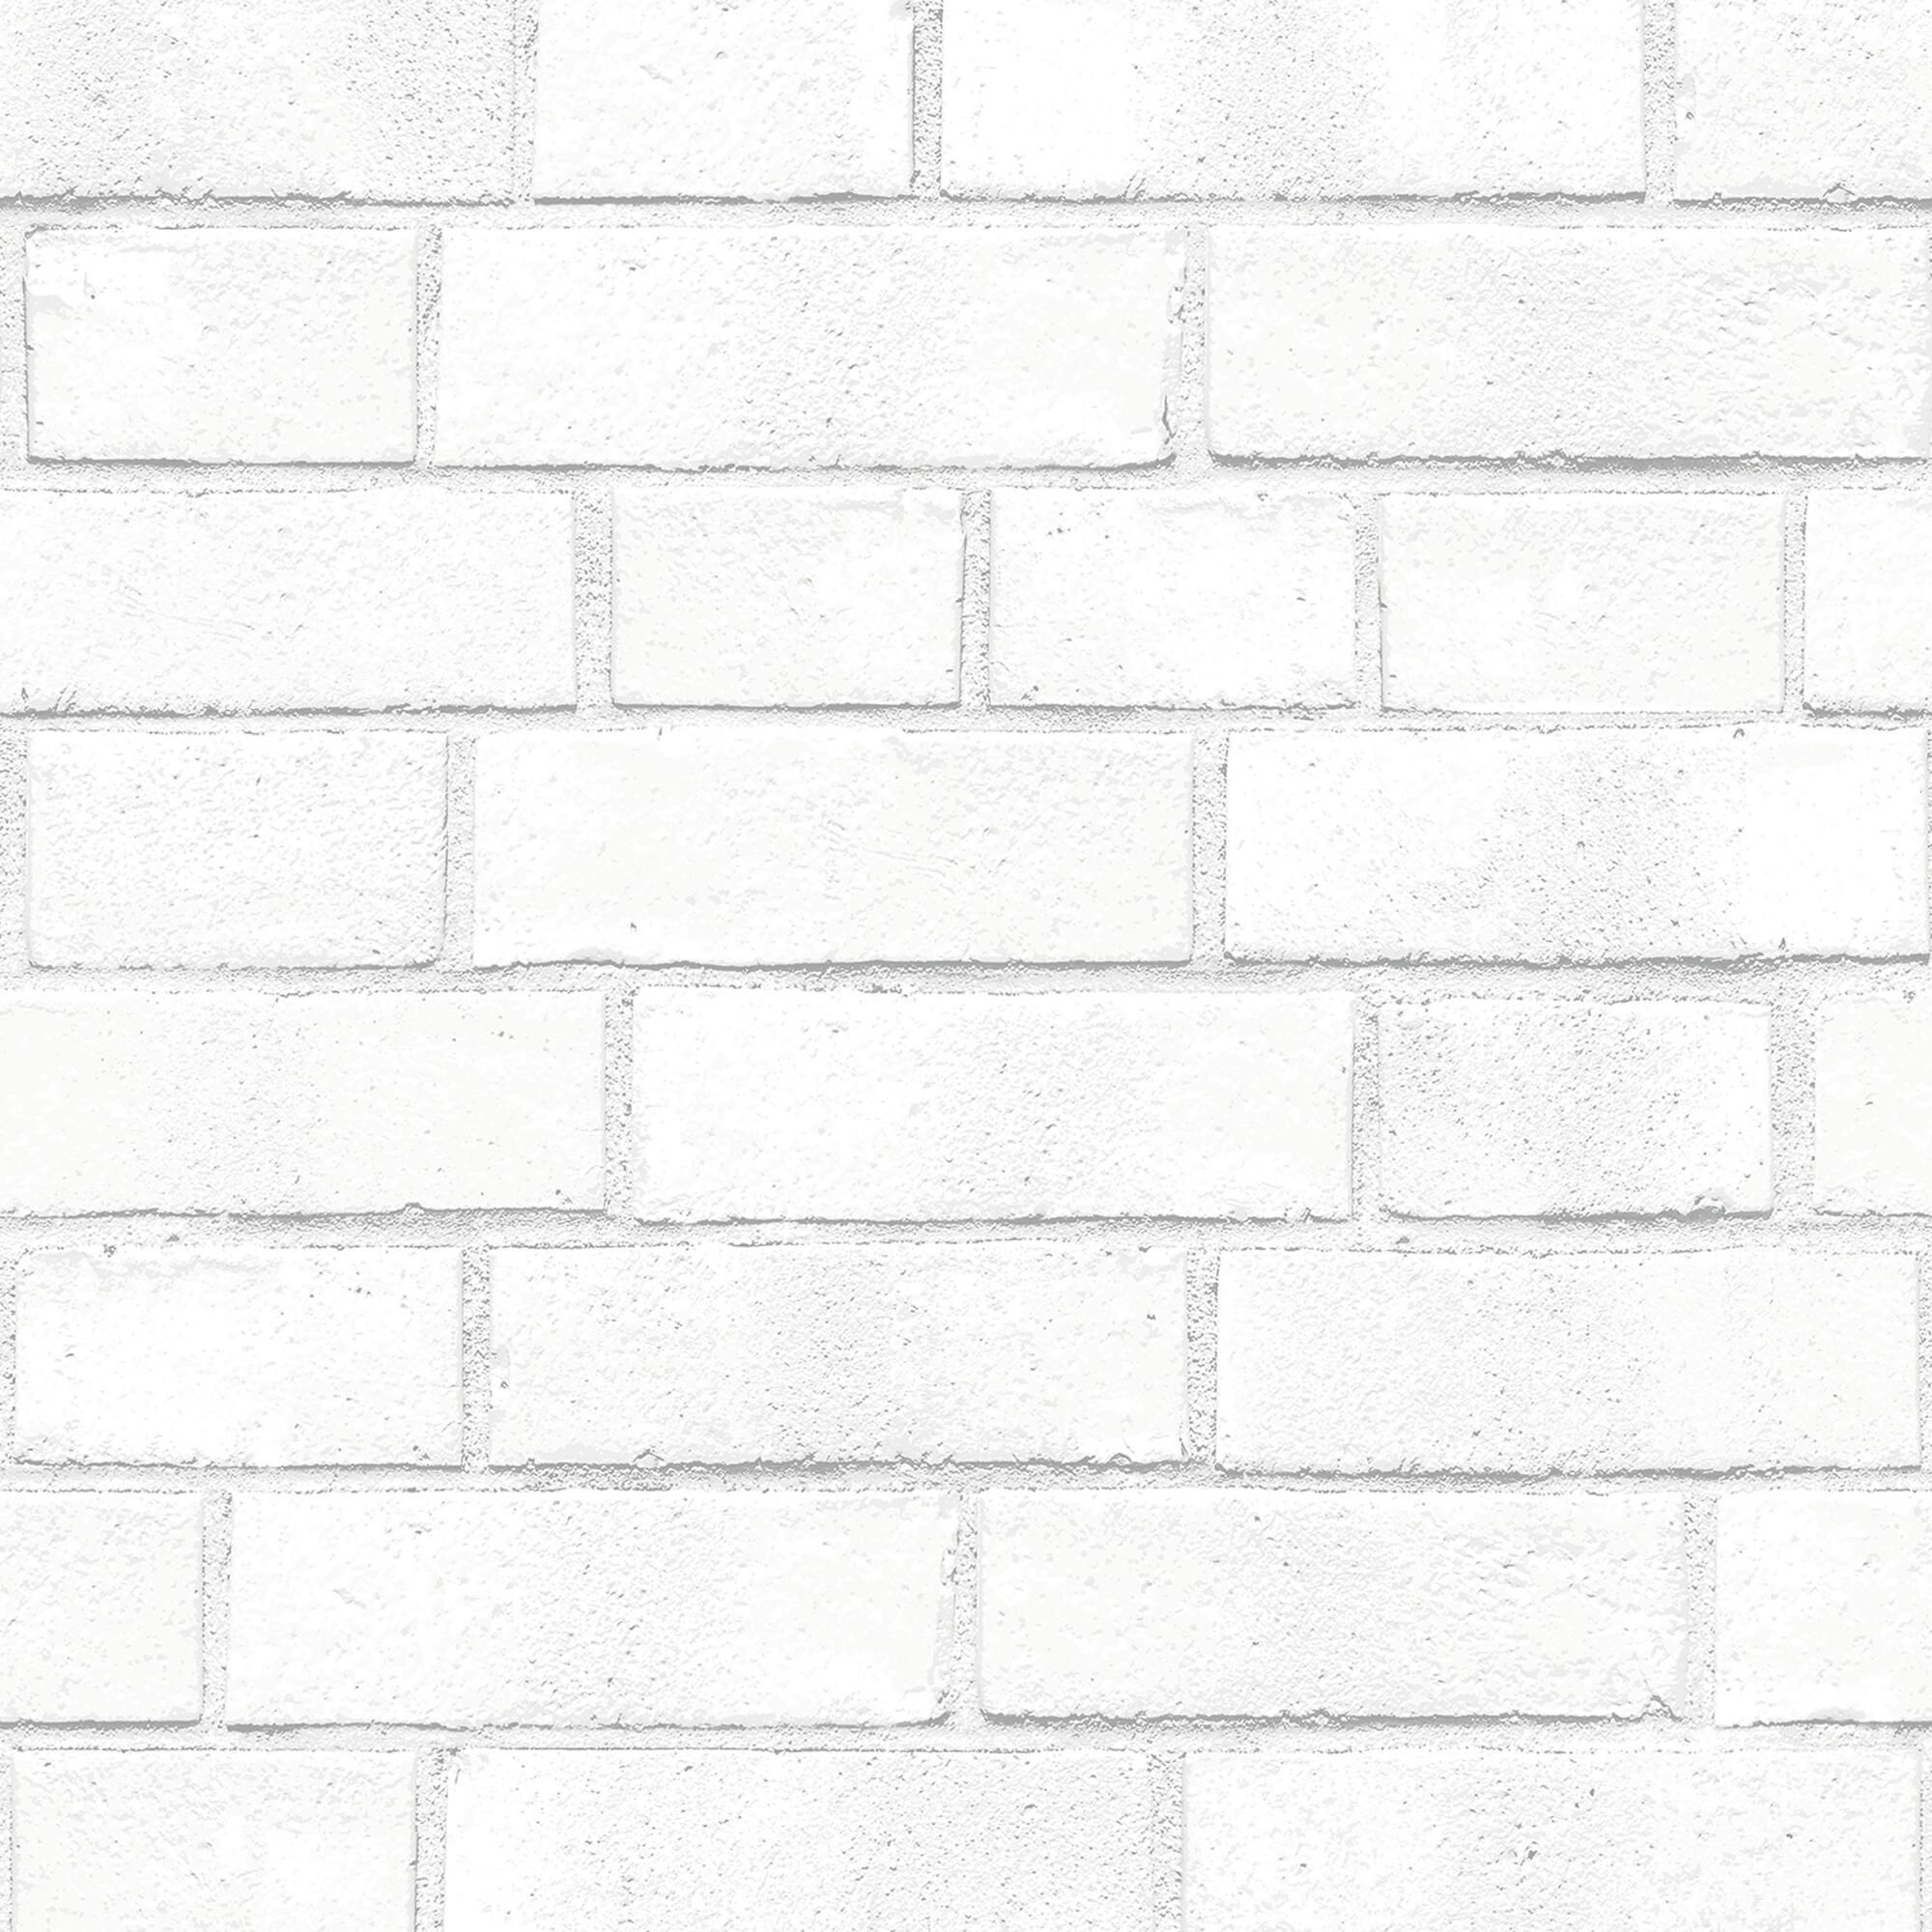 Whitewash Brick Peel And Stick Wallpaper By World Market White Textured Wallpaper Brick Wallpaper Brick Texture